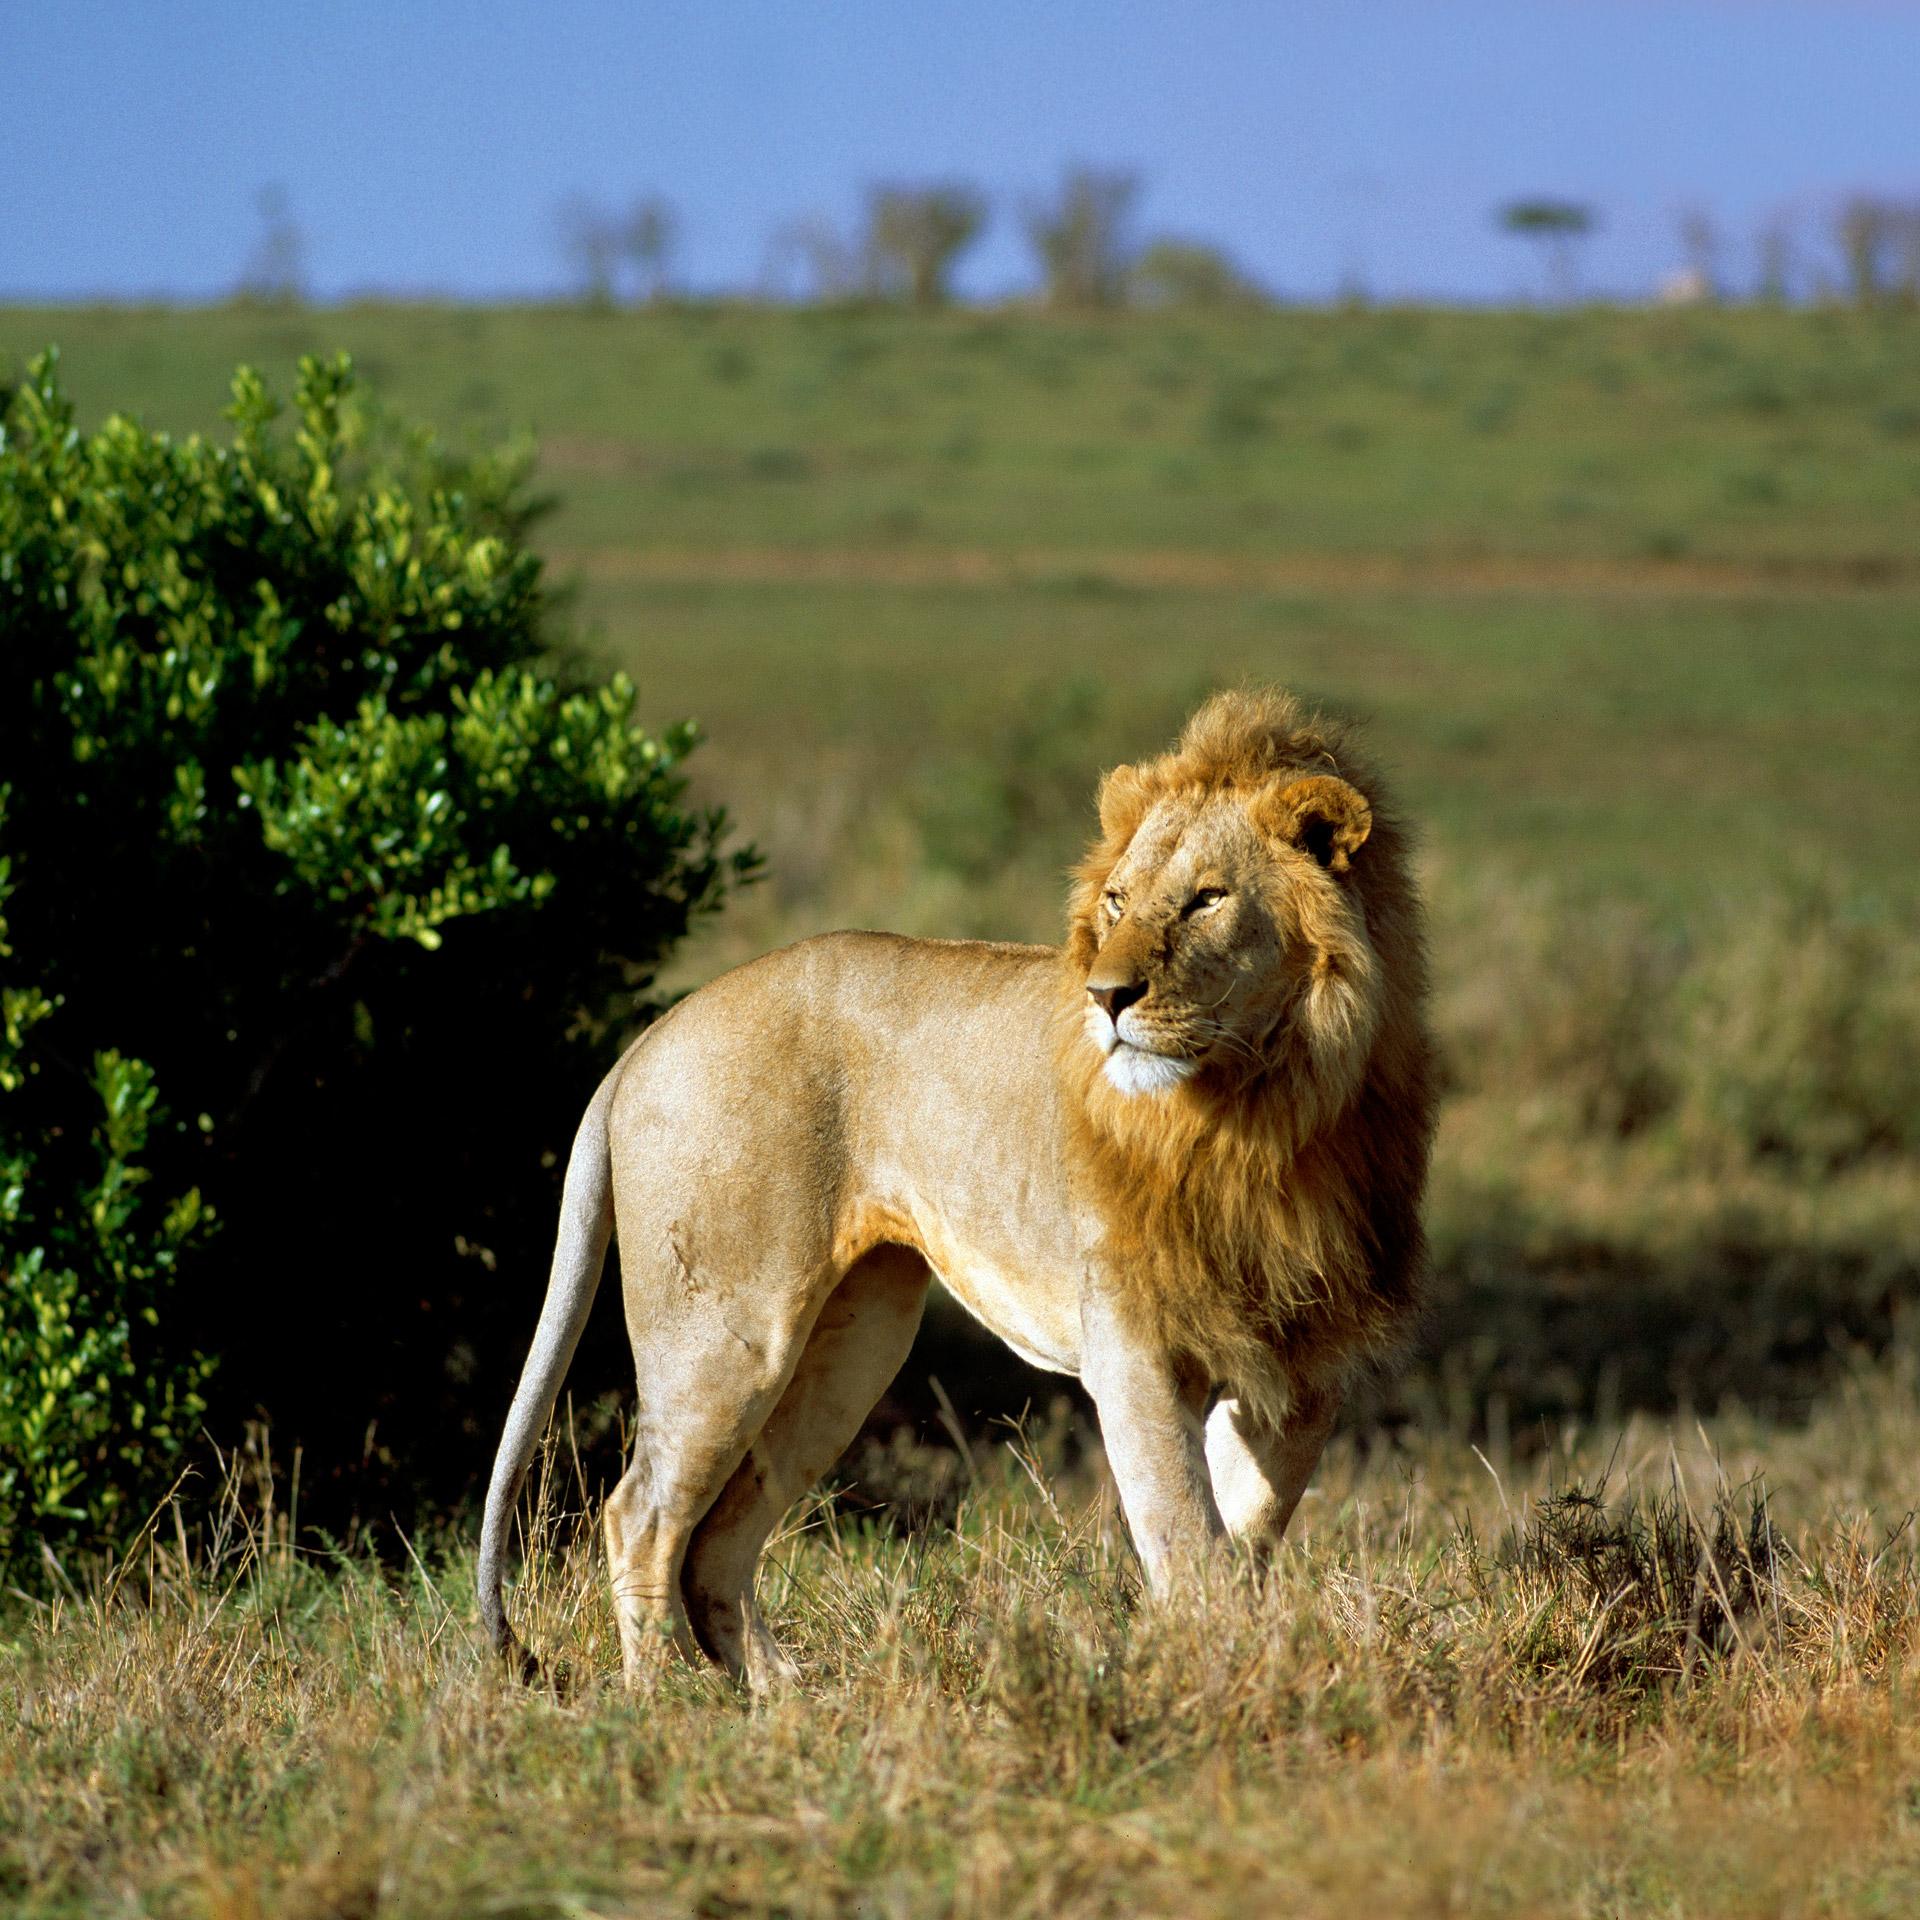 A male lion on Masai Mara in Kenya